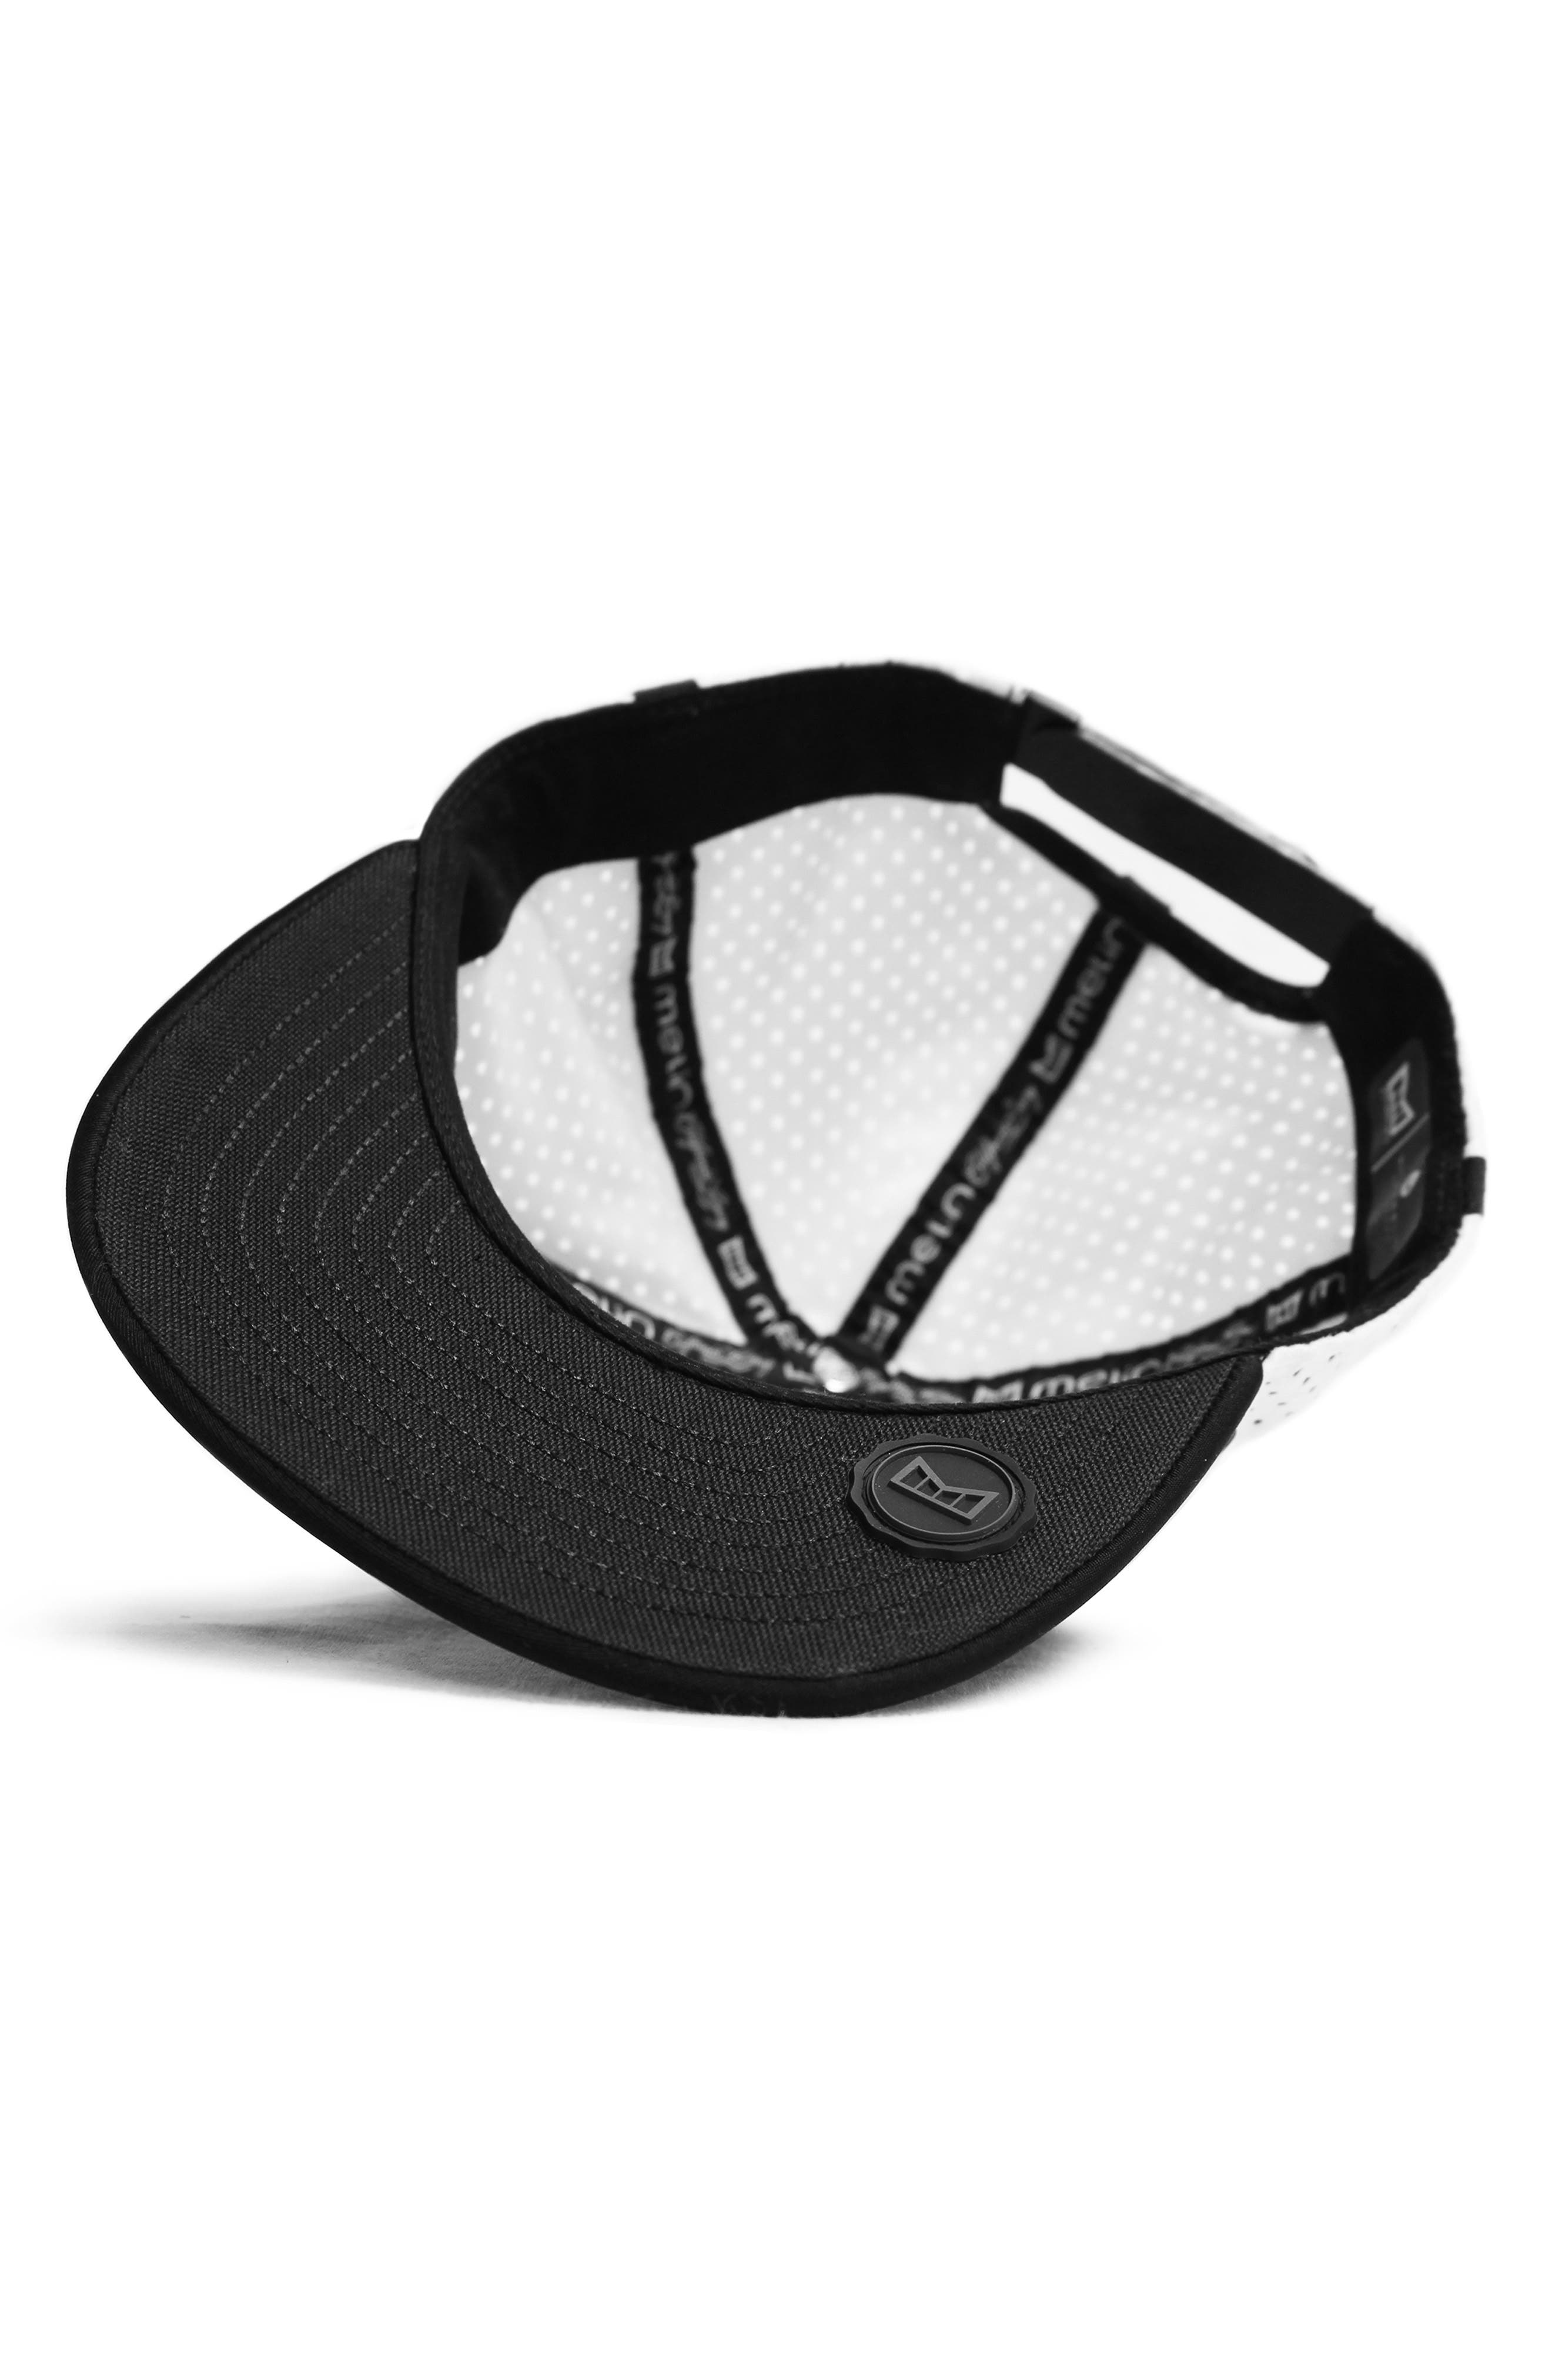 Alternate Image 2  - Melin 'Amphibian' Split Fit Snapback Baseball Cap